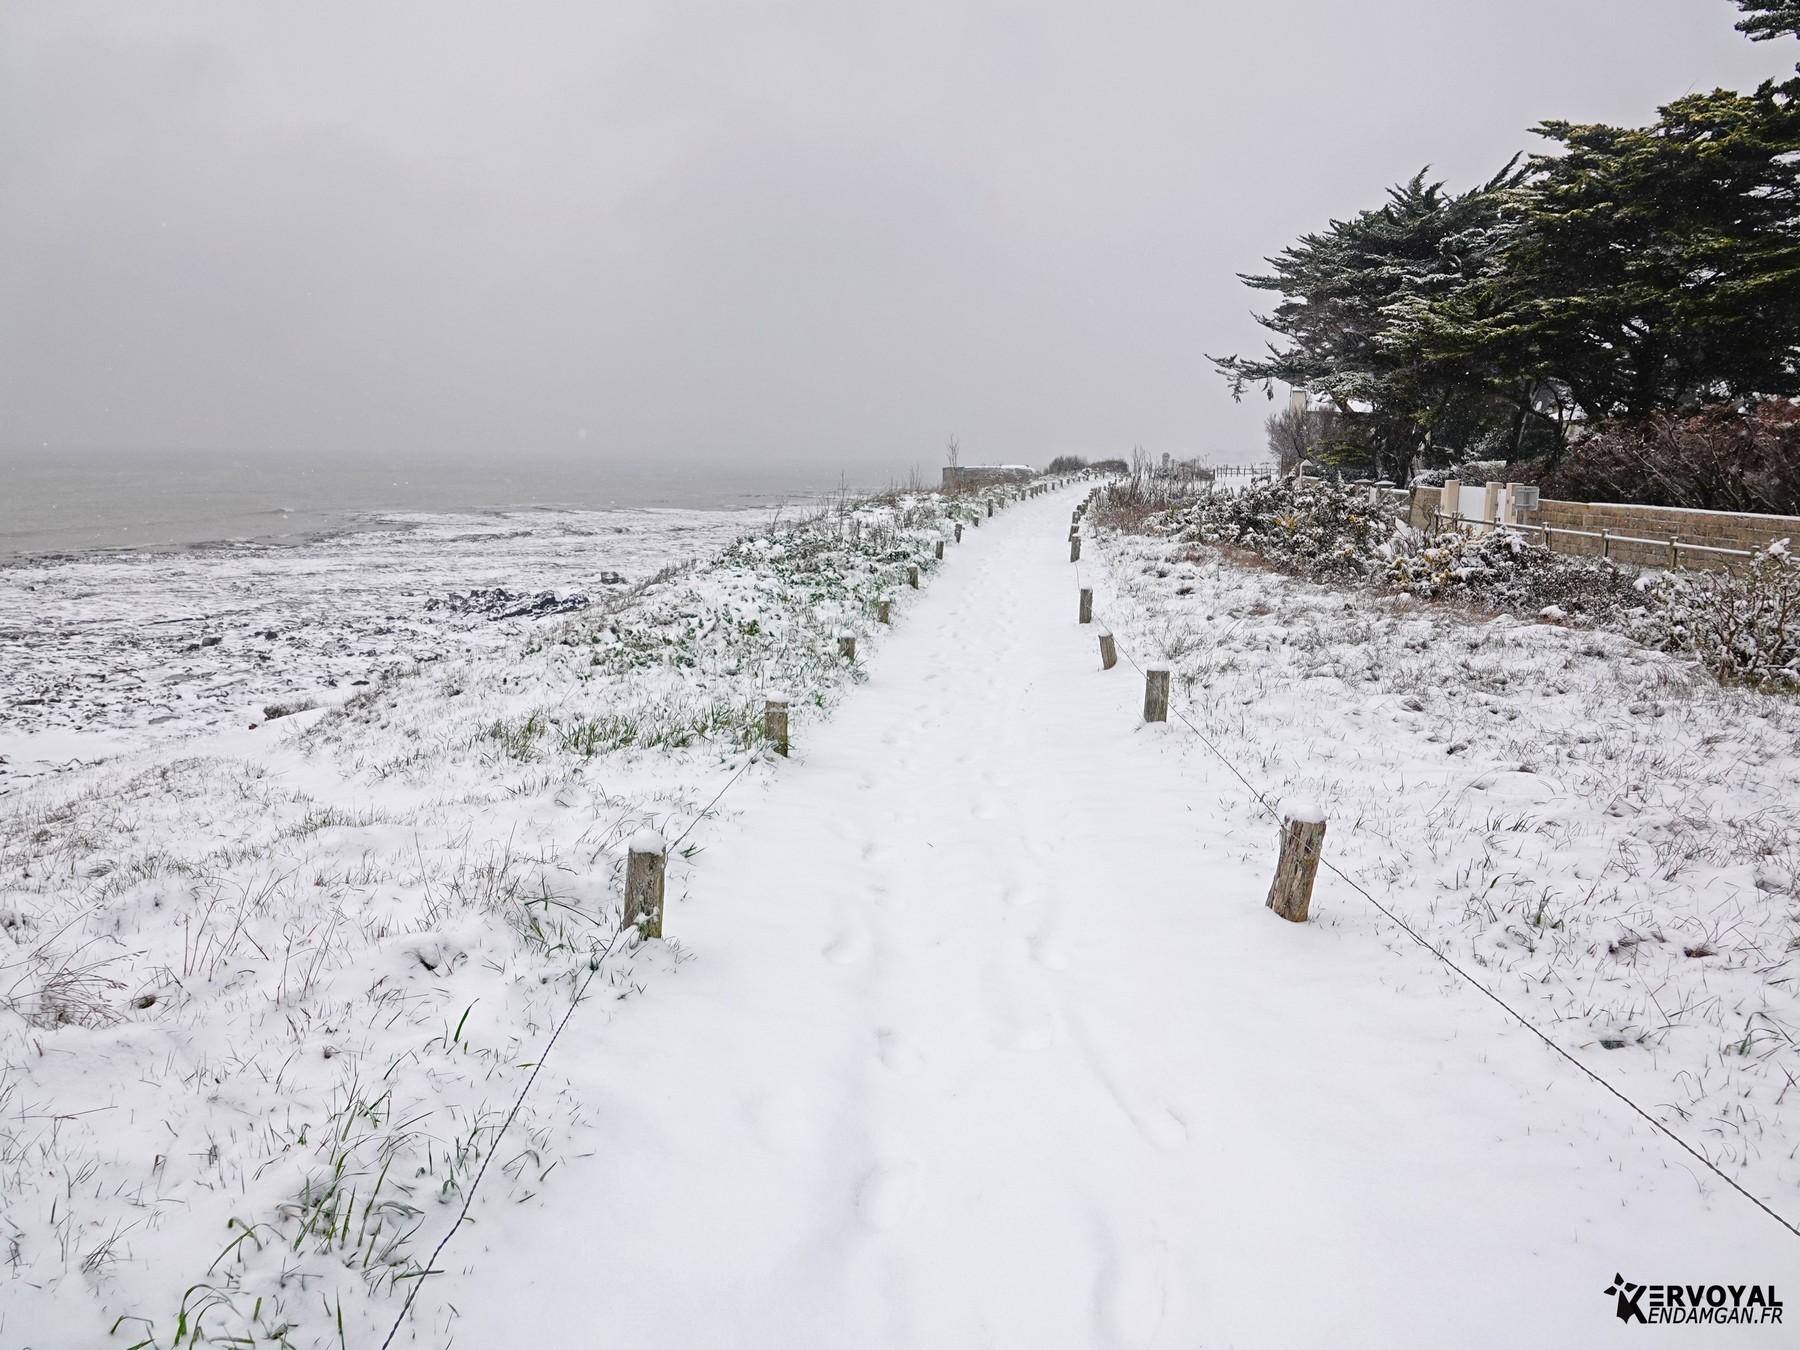 neige à kervoyal 11 février 2021 damgan morbihan (3)